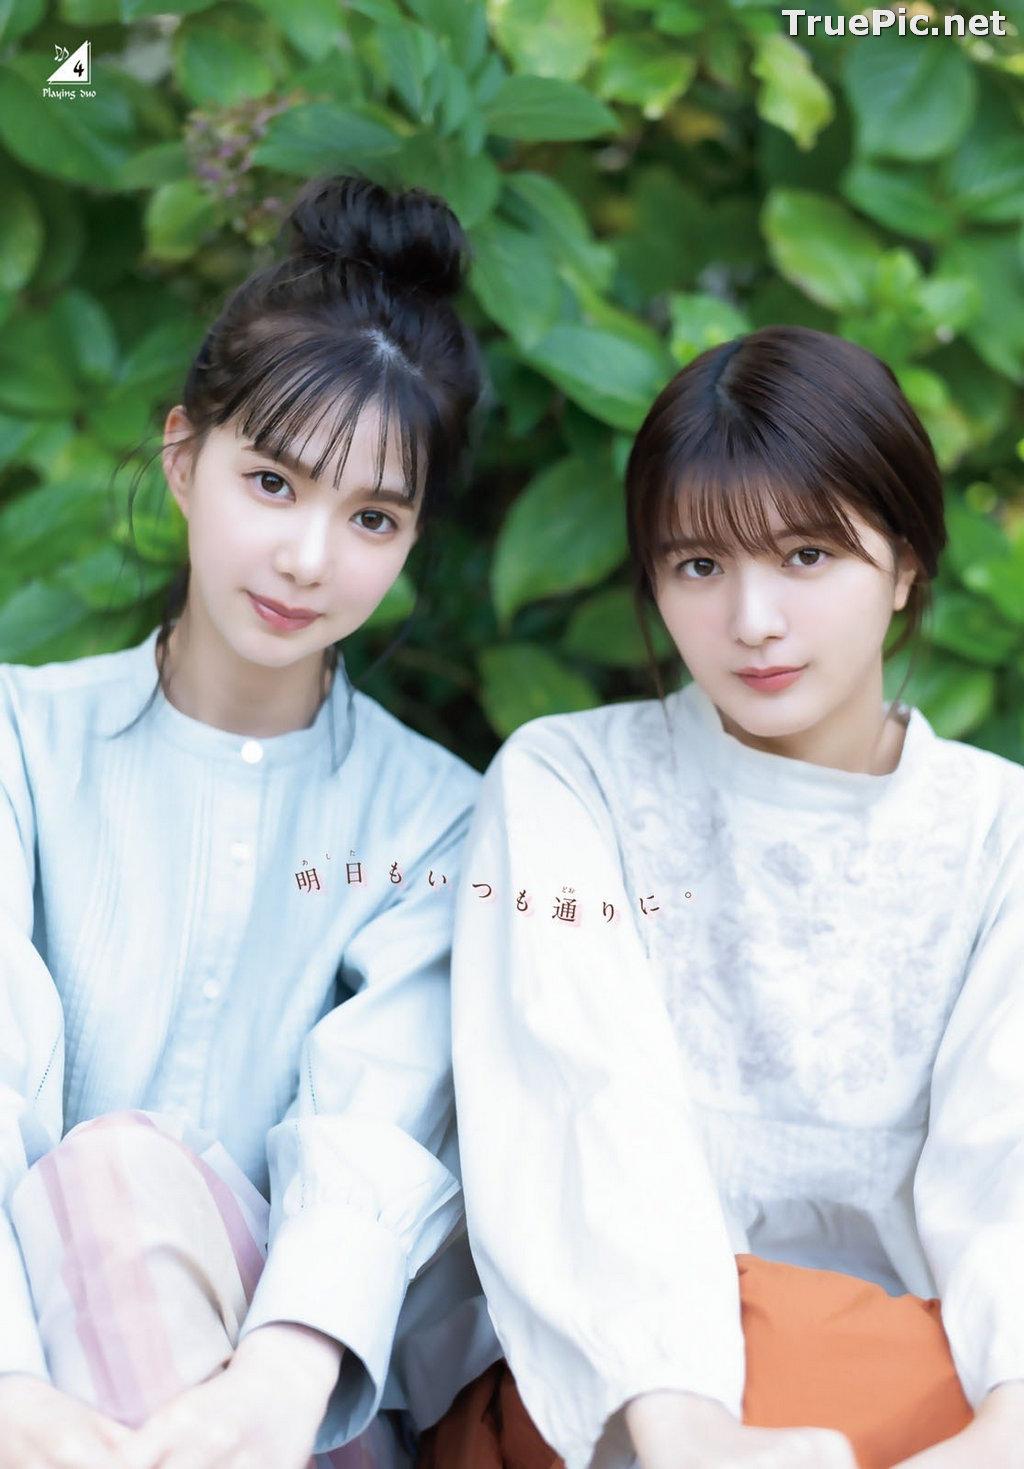 Image Japanese Idol Singer - Yumiko Seki (関有美子) - Beautiful Picture Collection 2020 - TruePic.net - Picture-10